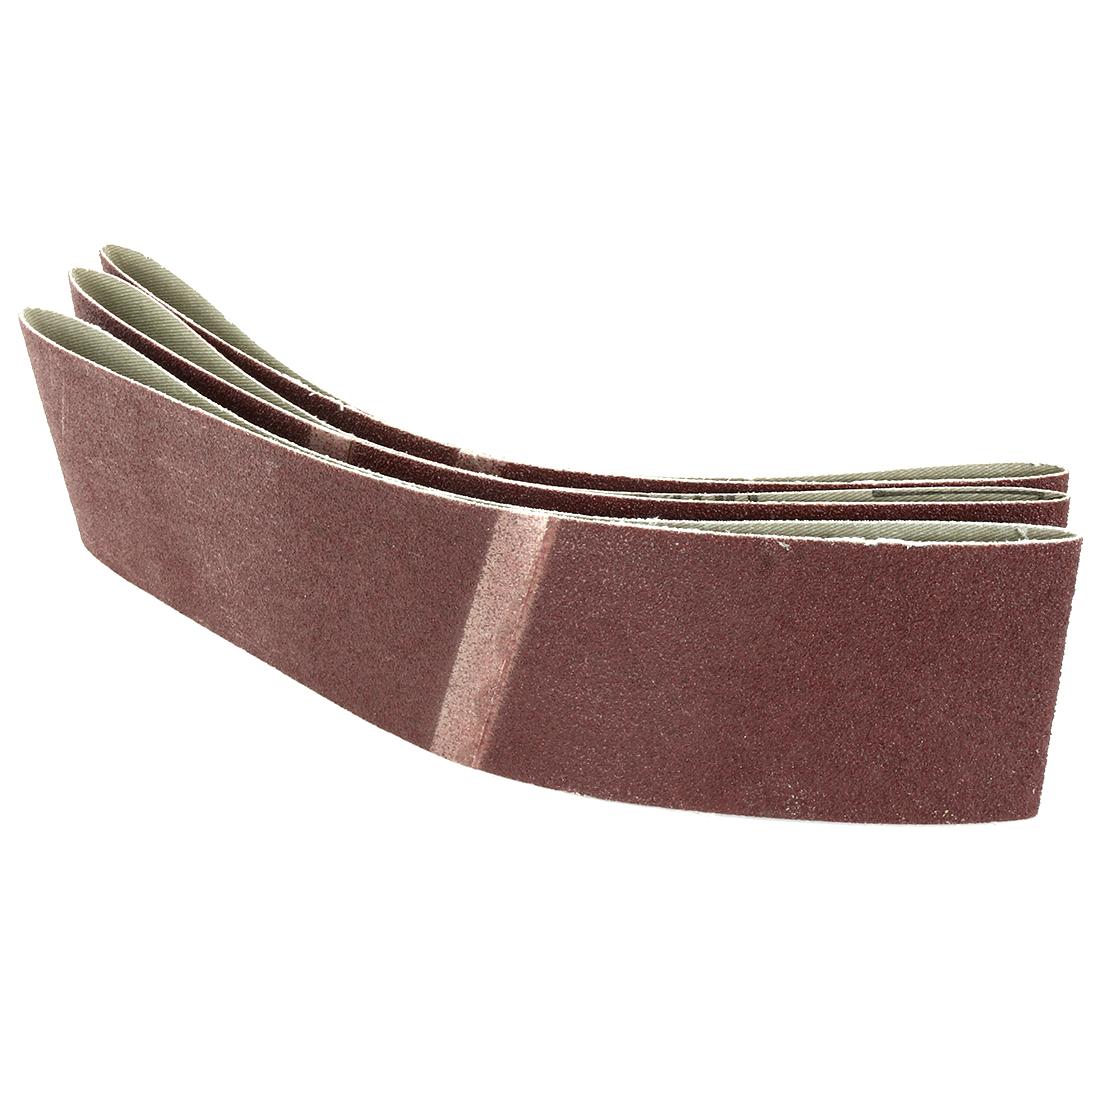 3-Inch x 21-Inch 100 Grit Lapped Butt Joint Aluminum Oxide Sanding Belt 3pcs - image 1 of 3